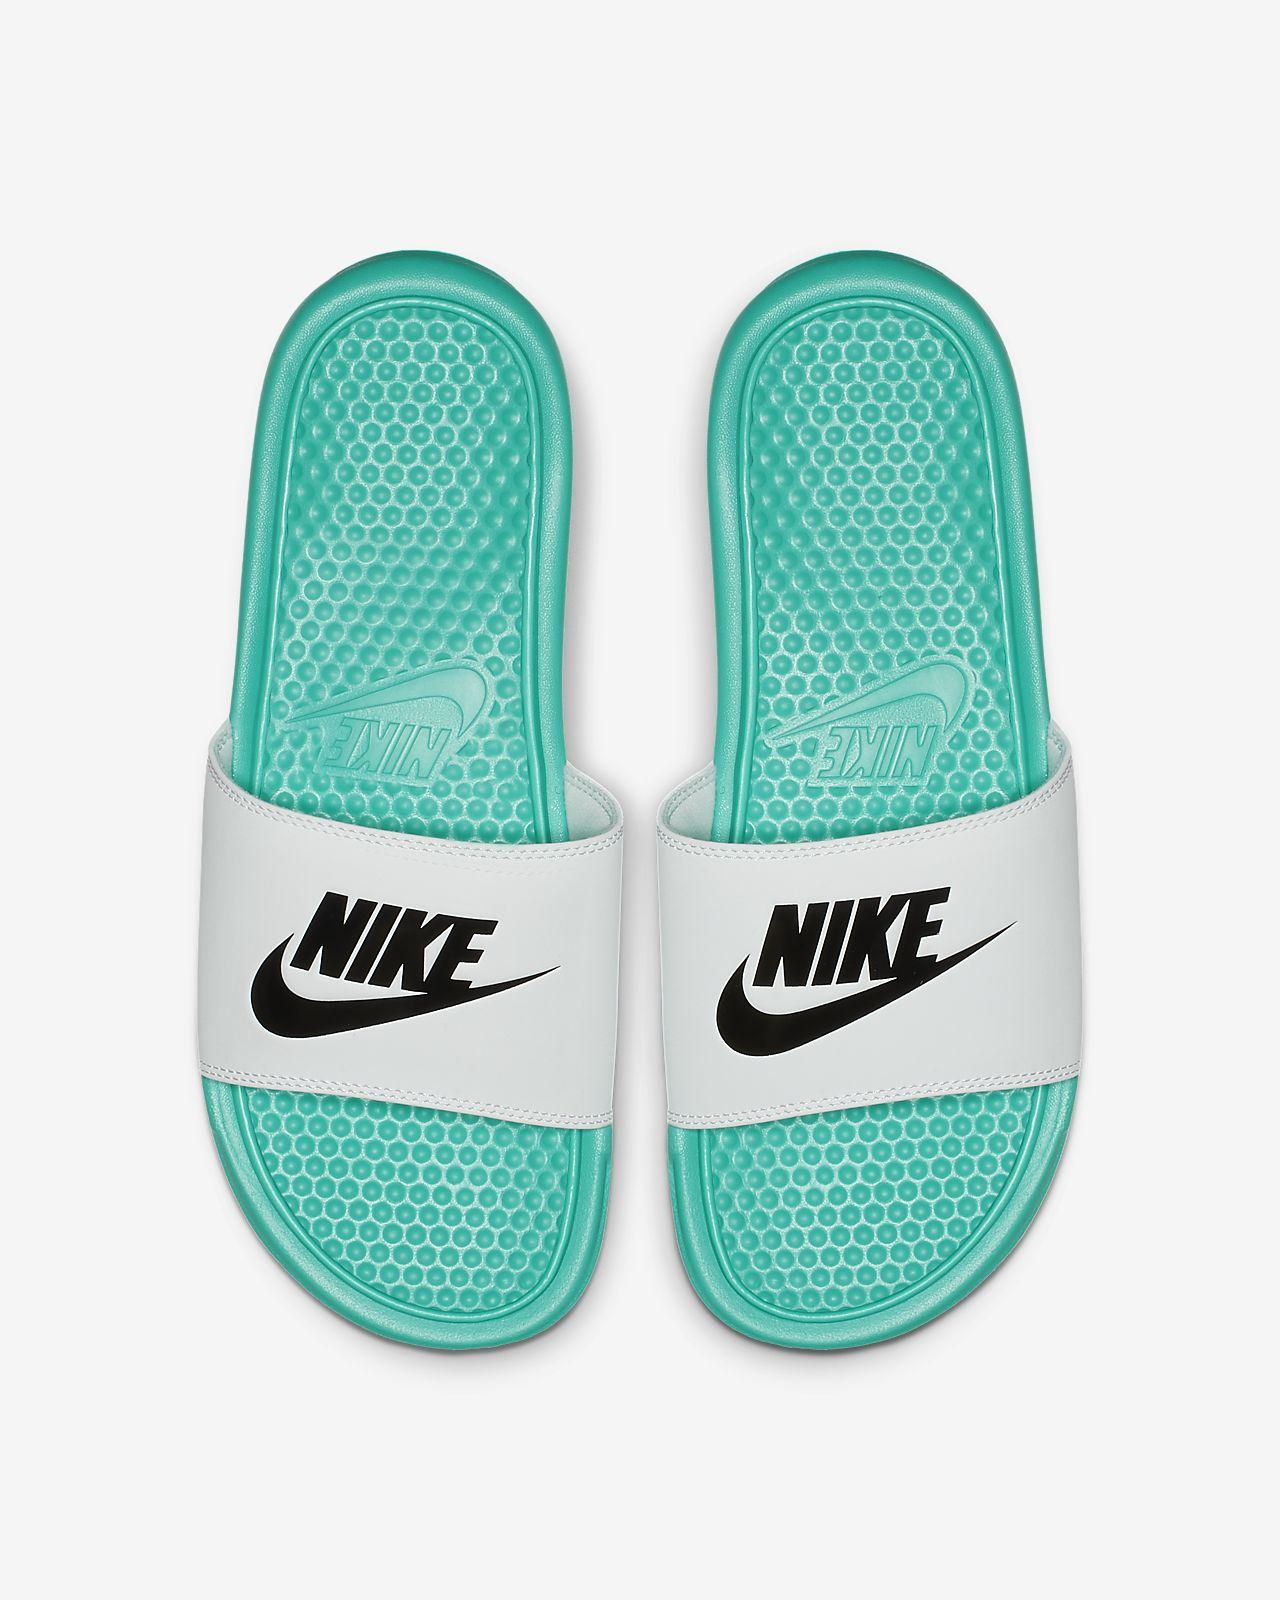 9aefb27ca1 Low Resolution Chinelos Nike Benassi Chinelos Nike Benassi